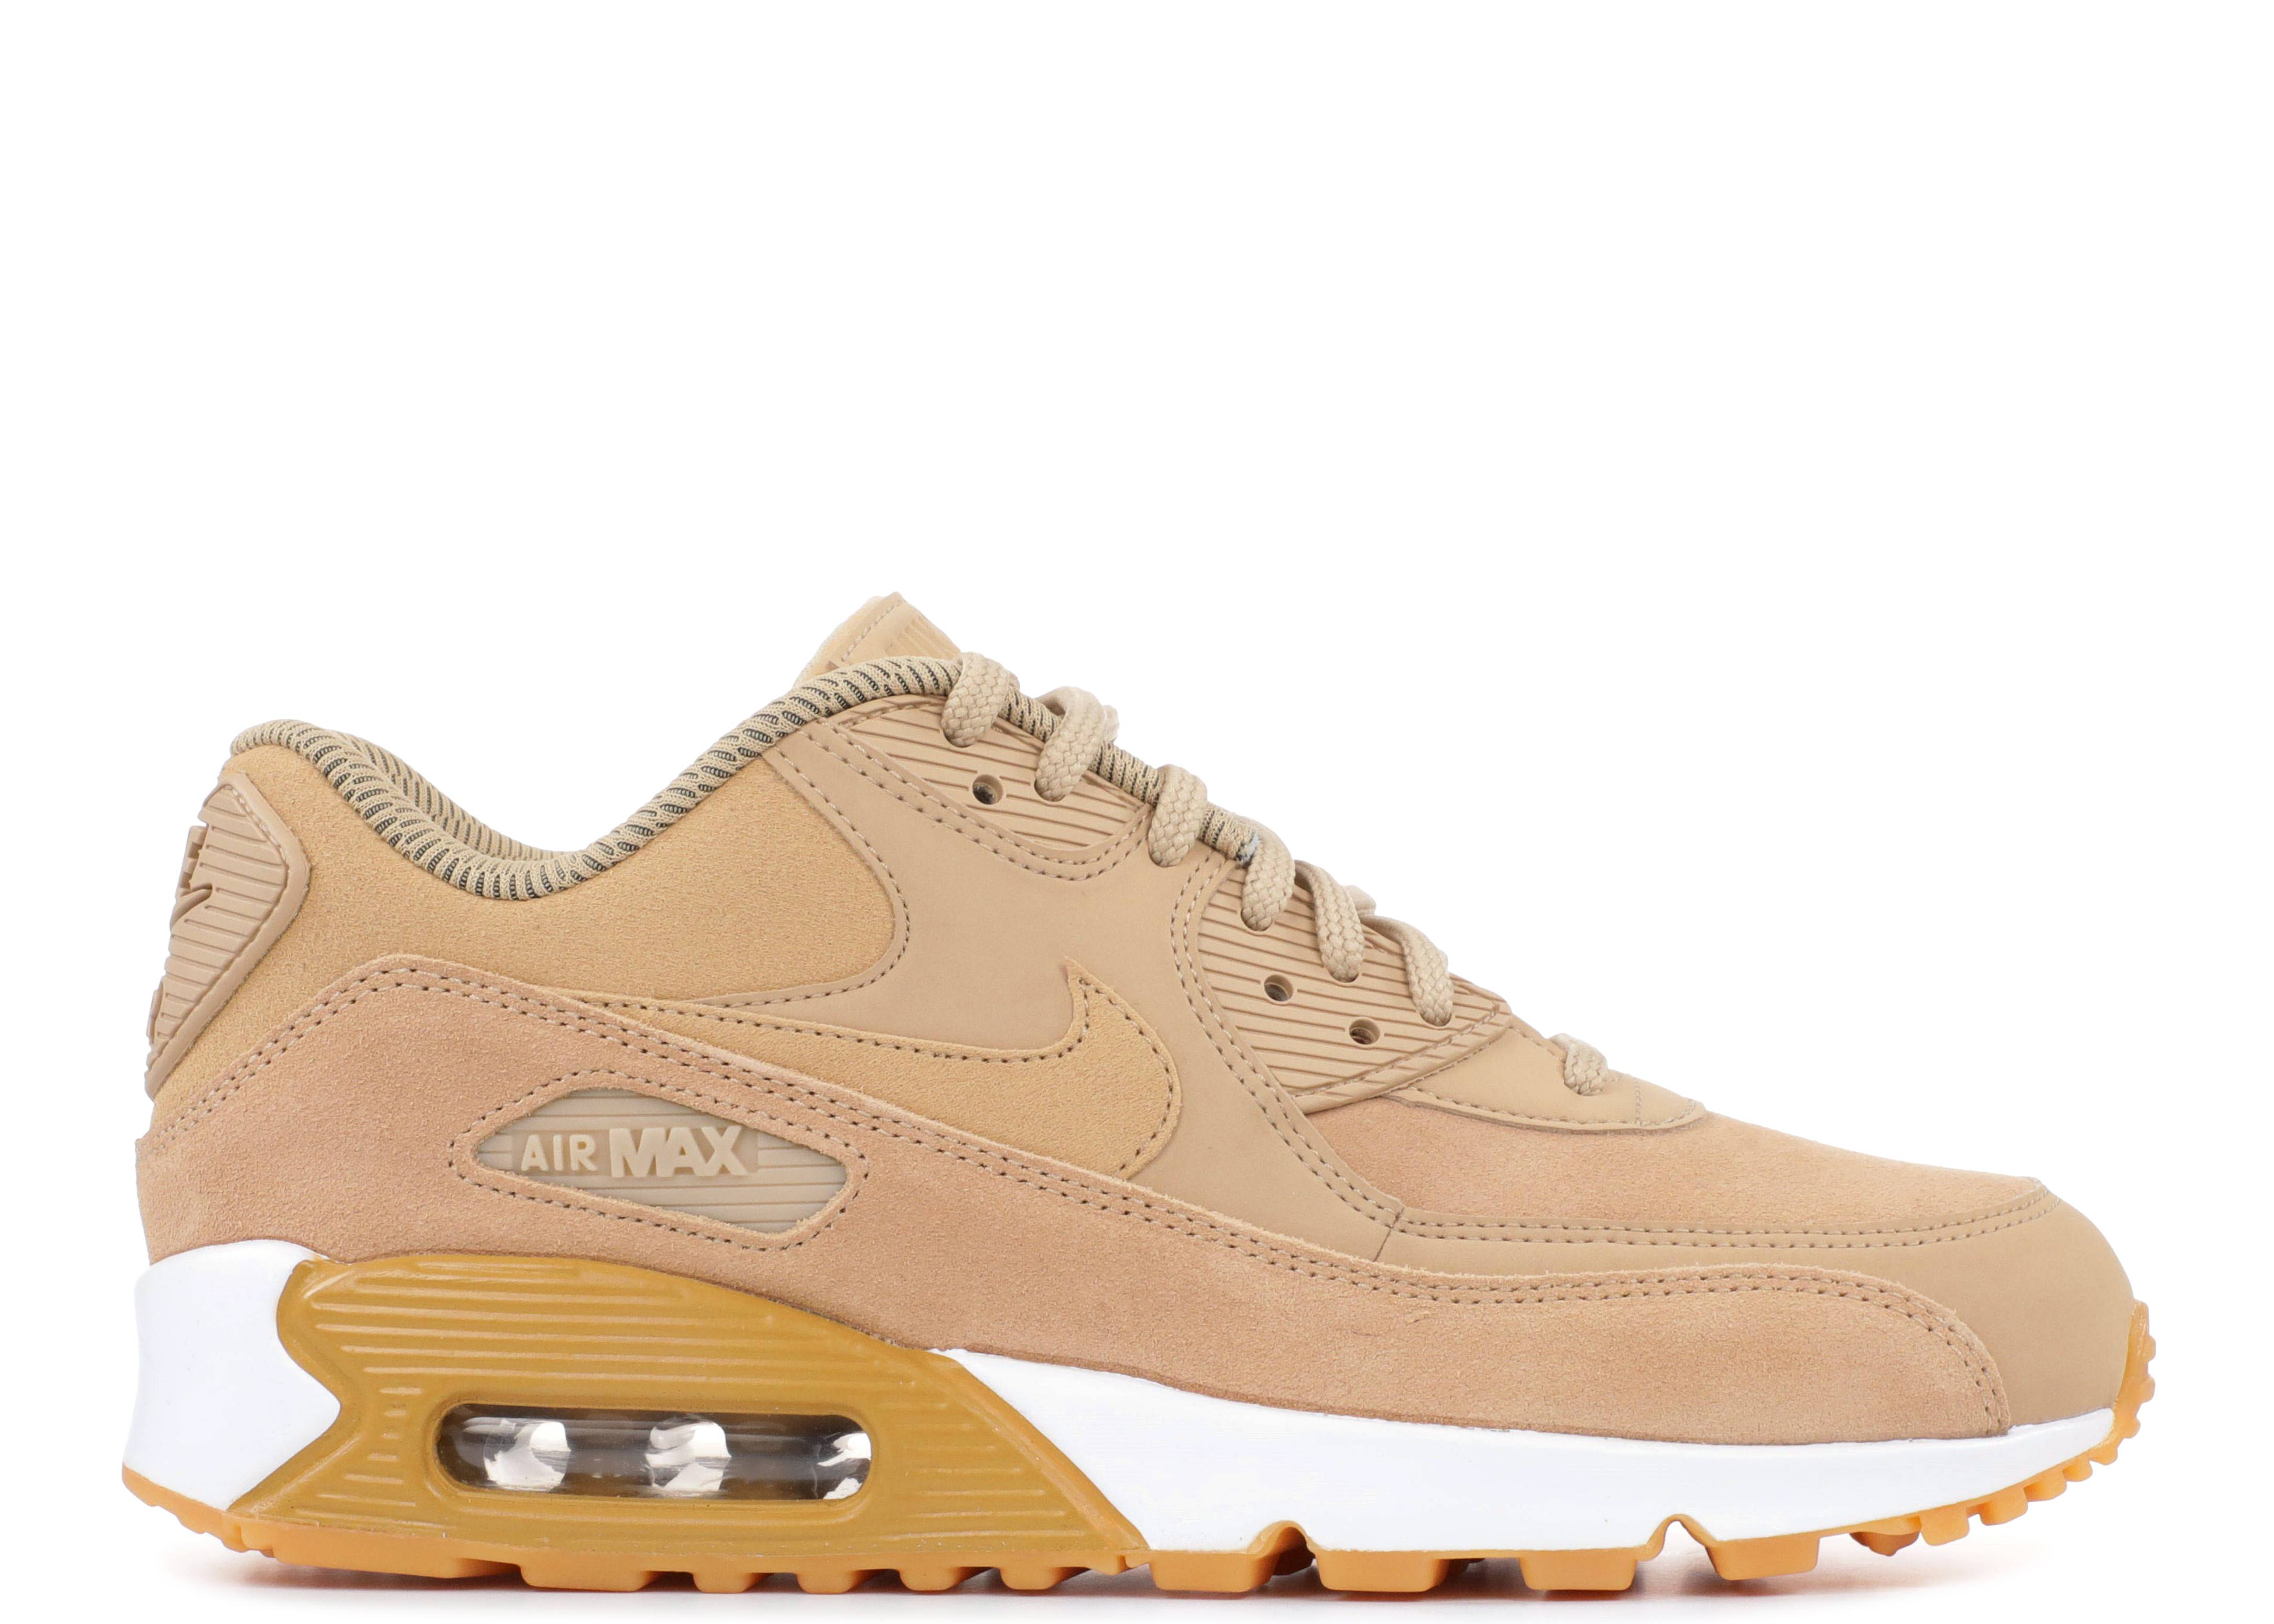 detailed look 17c2b 8084c Wmns Air Max 90 Se - Nike - 881105 200 - mushroom  mushroom   Flight Club